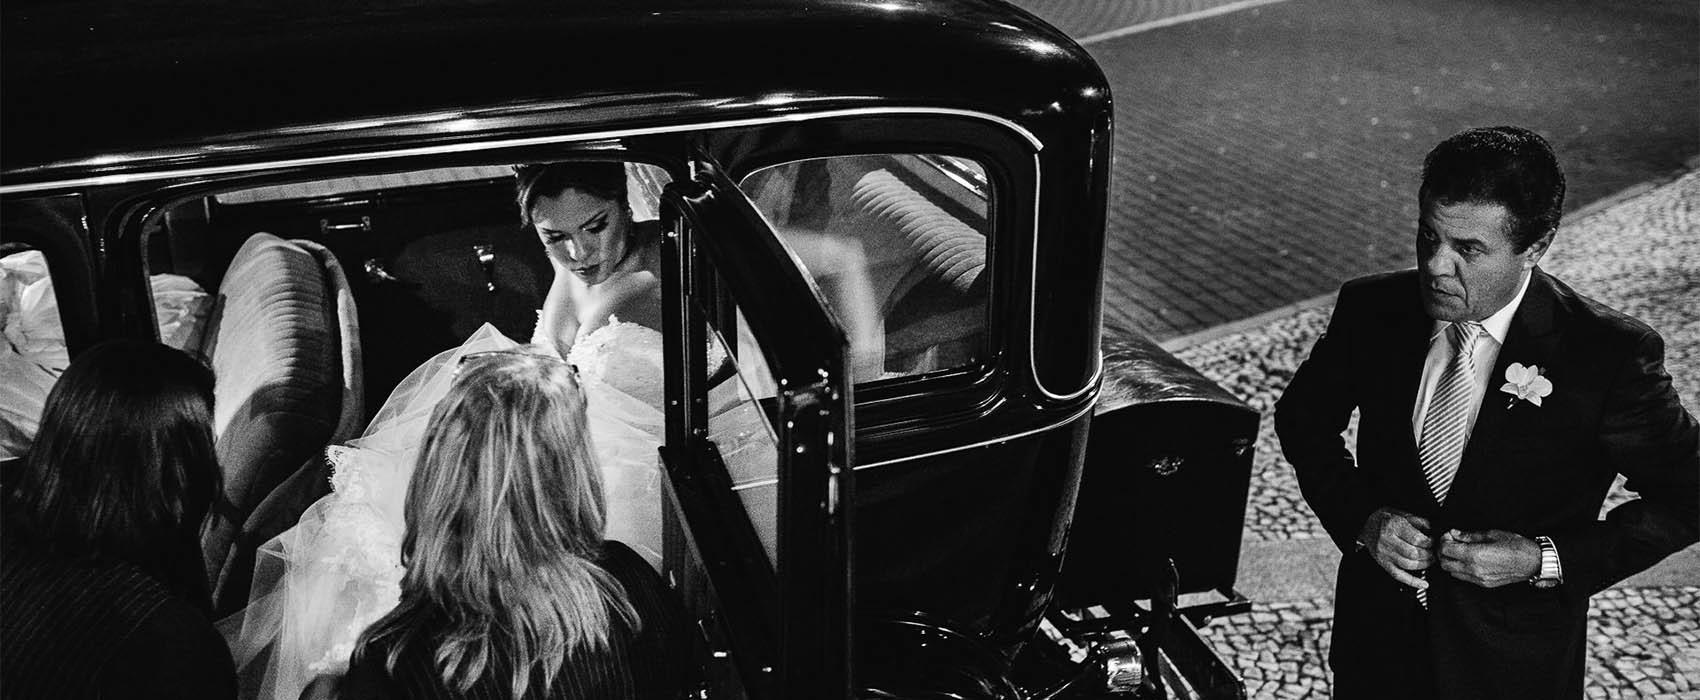 renato dpaula foto de casamento carro antigo classico noiva chegando na igreja